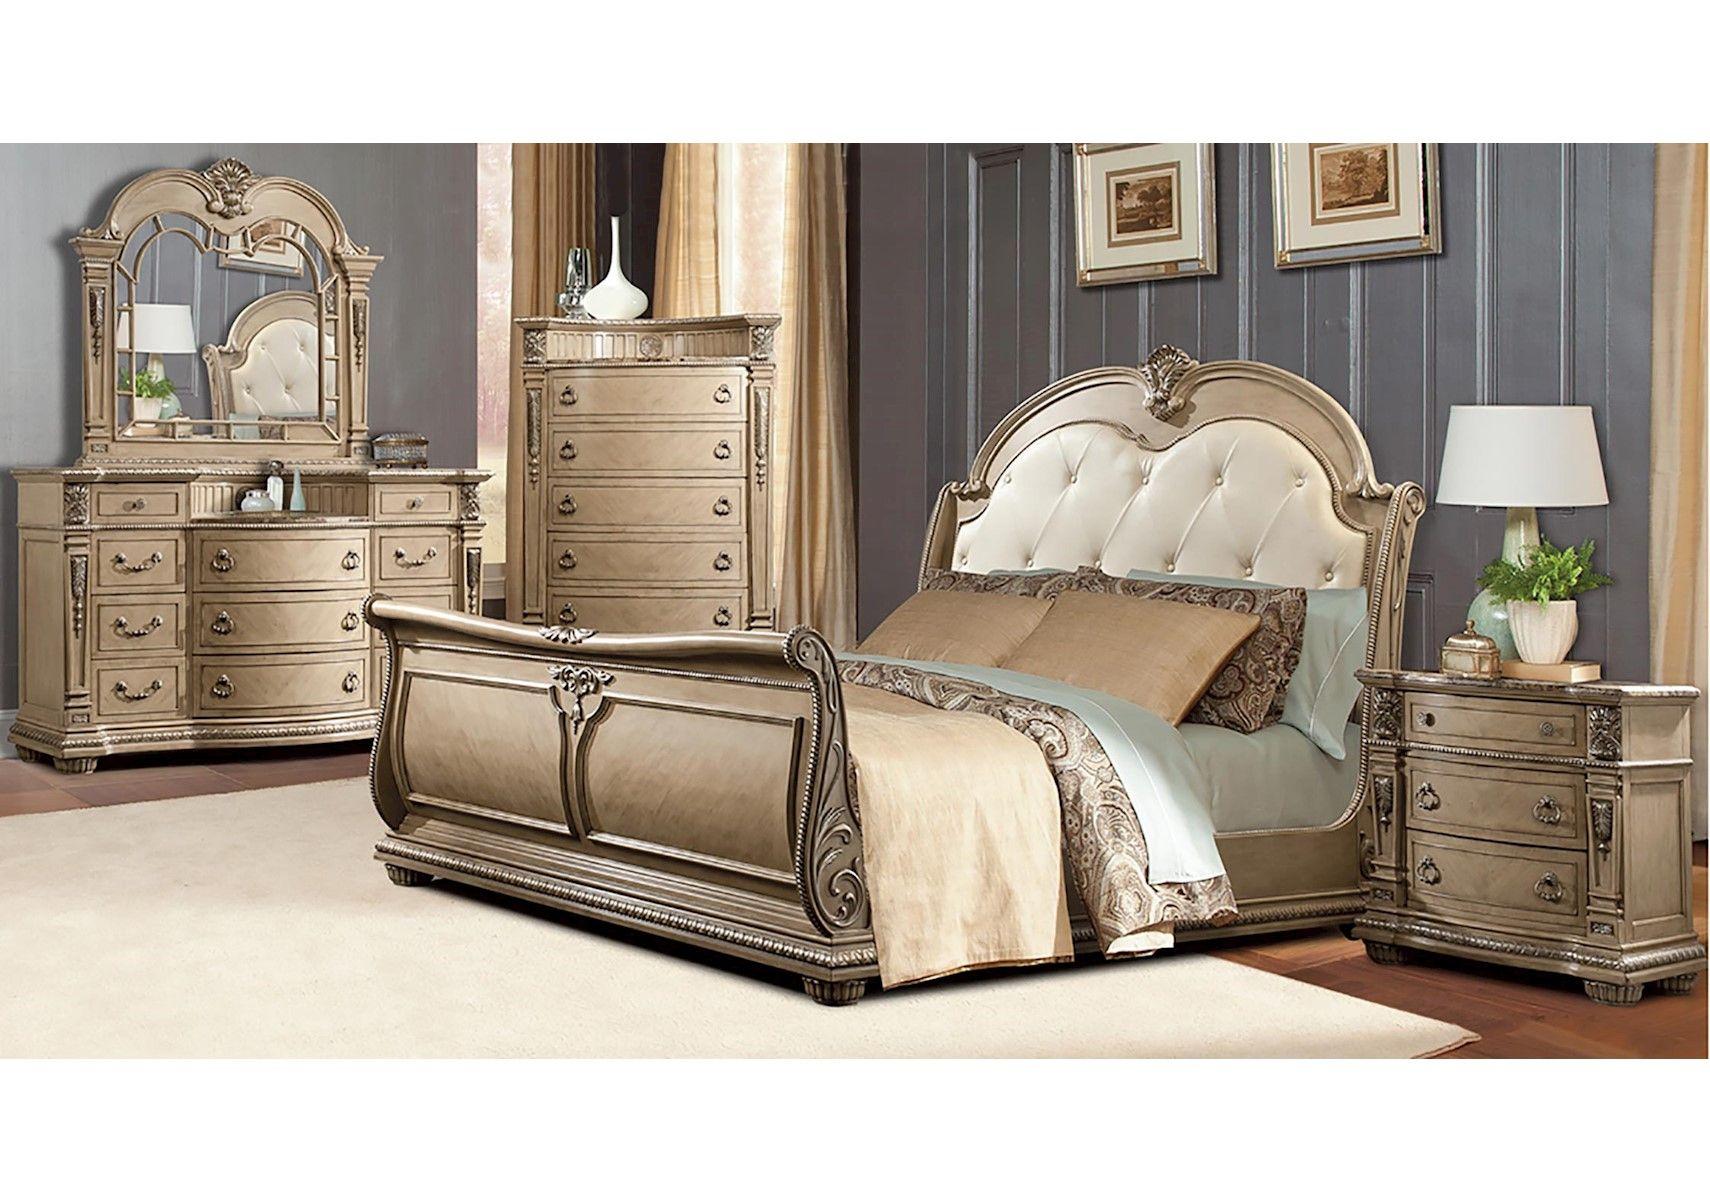 Lacks Monaco 4 Pc Queen Bedroom Set Bedroom Furniture Sets